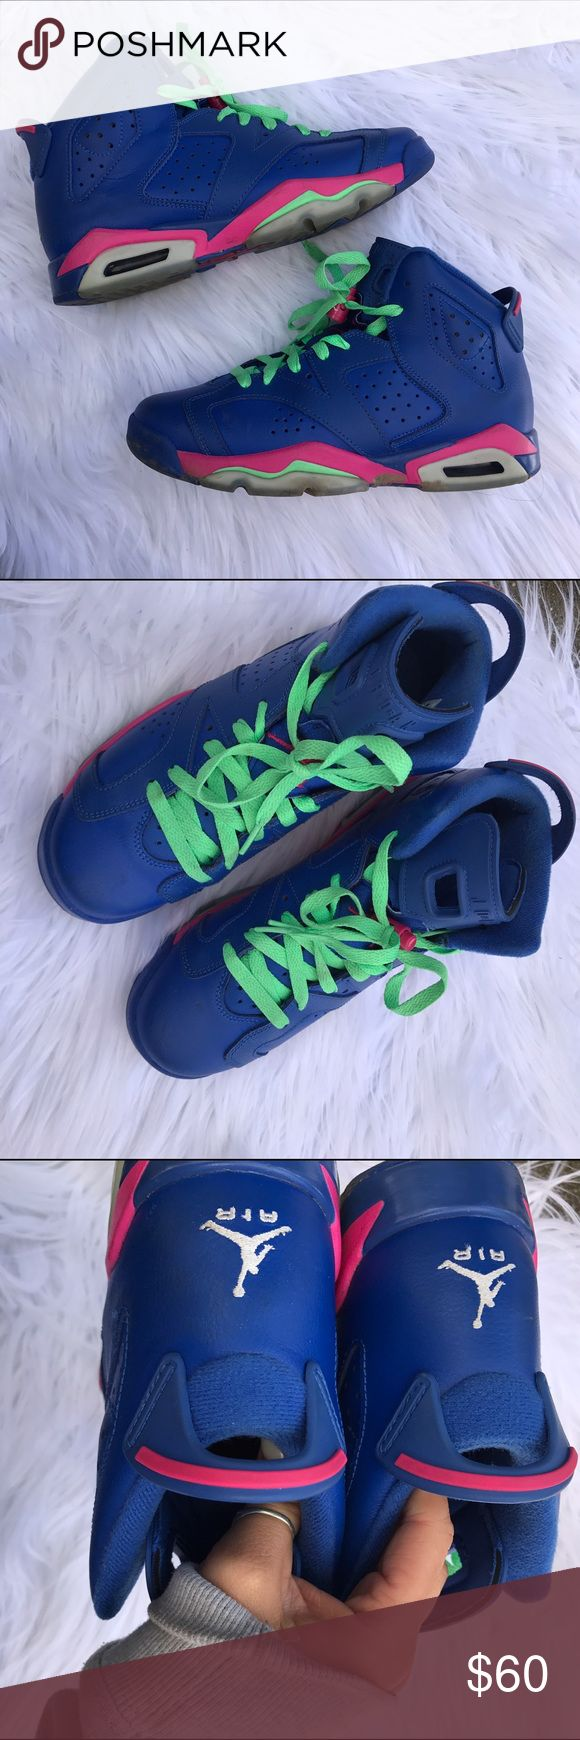 JORDAN 6 SZ 7.5 BLUE SNEAKERS SHOES PINK 100% authentic Jordan 6 Jordan Shoes